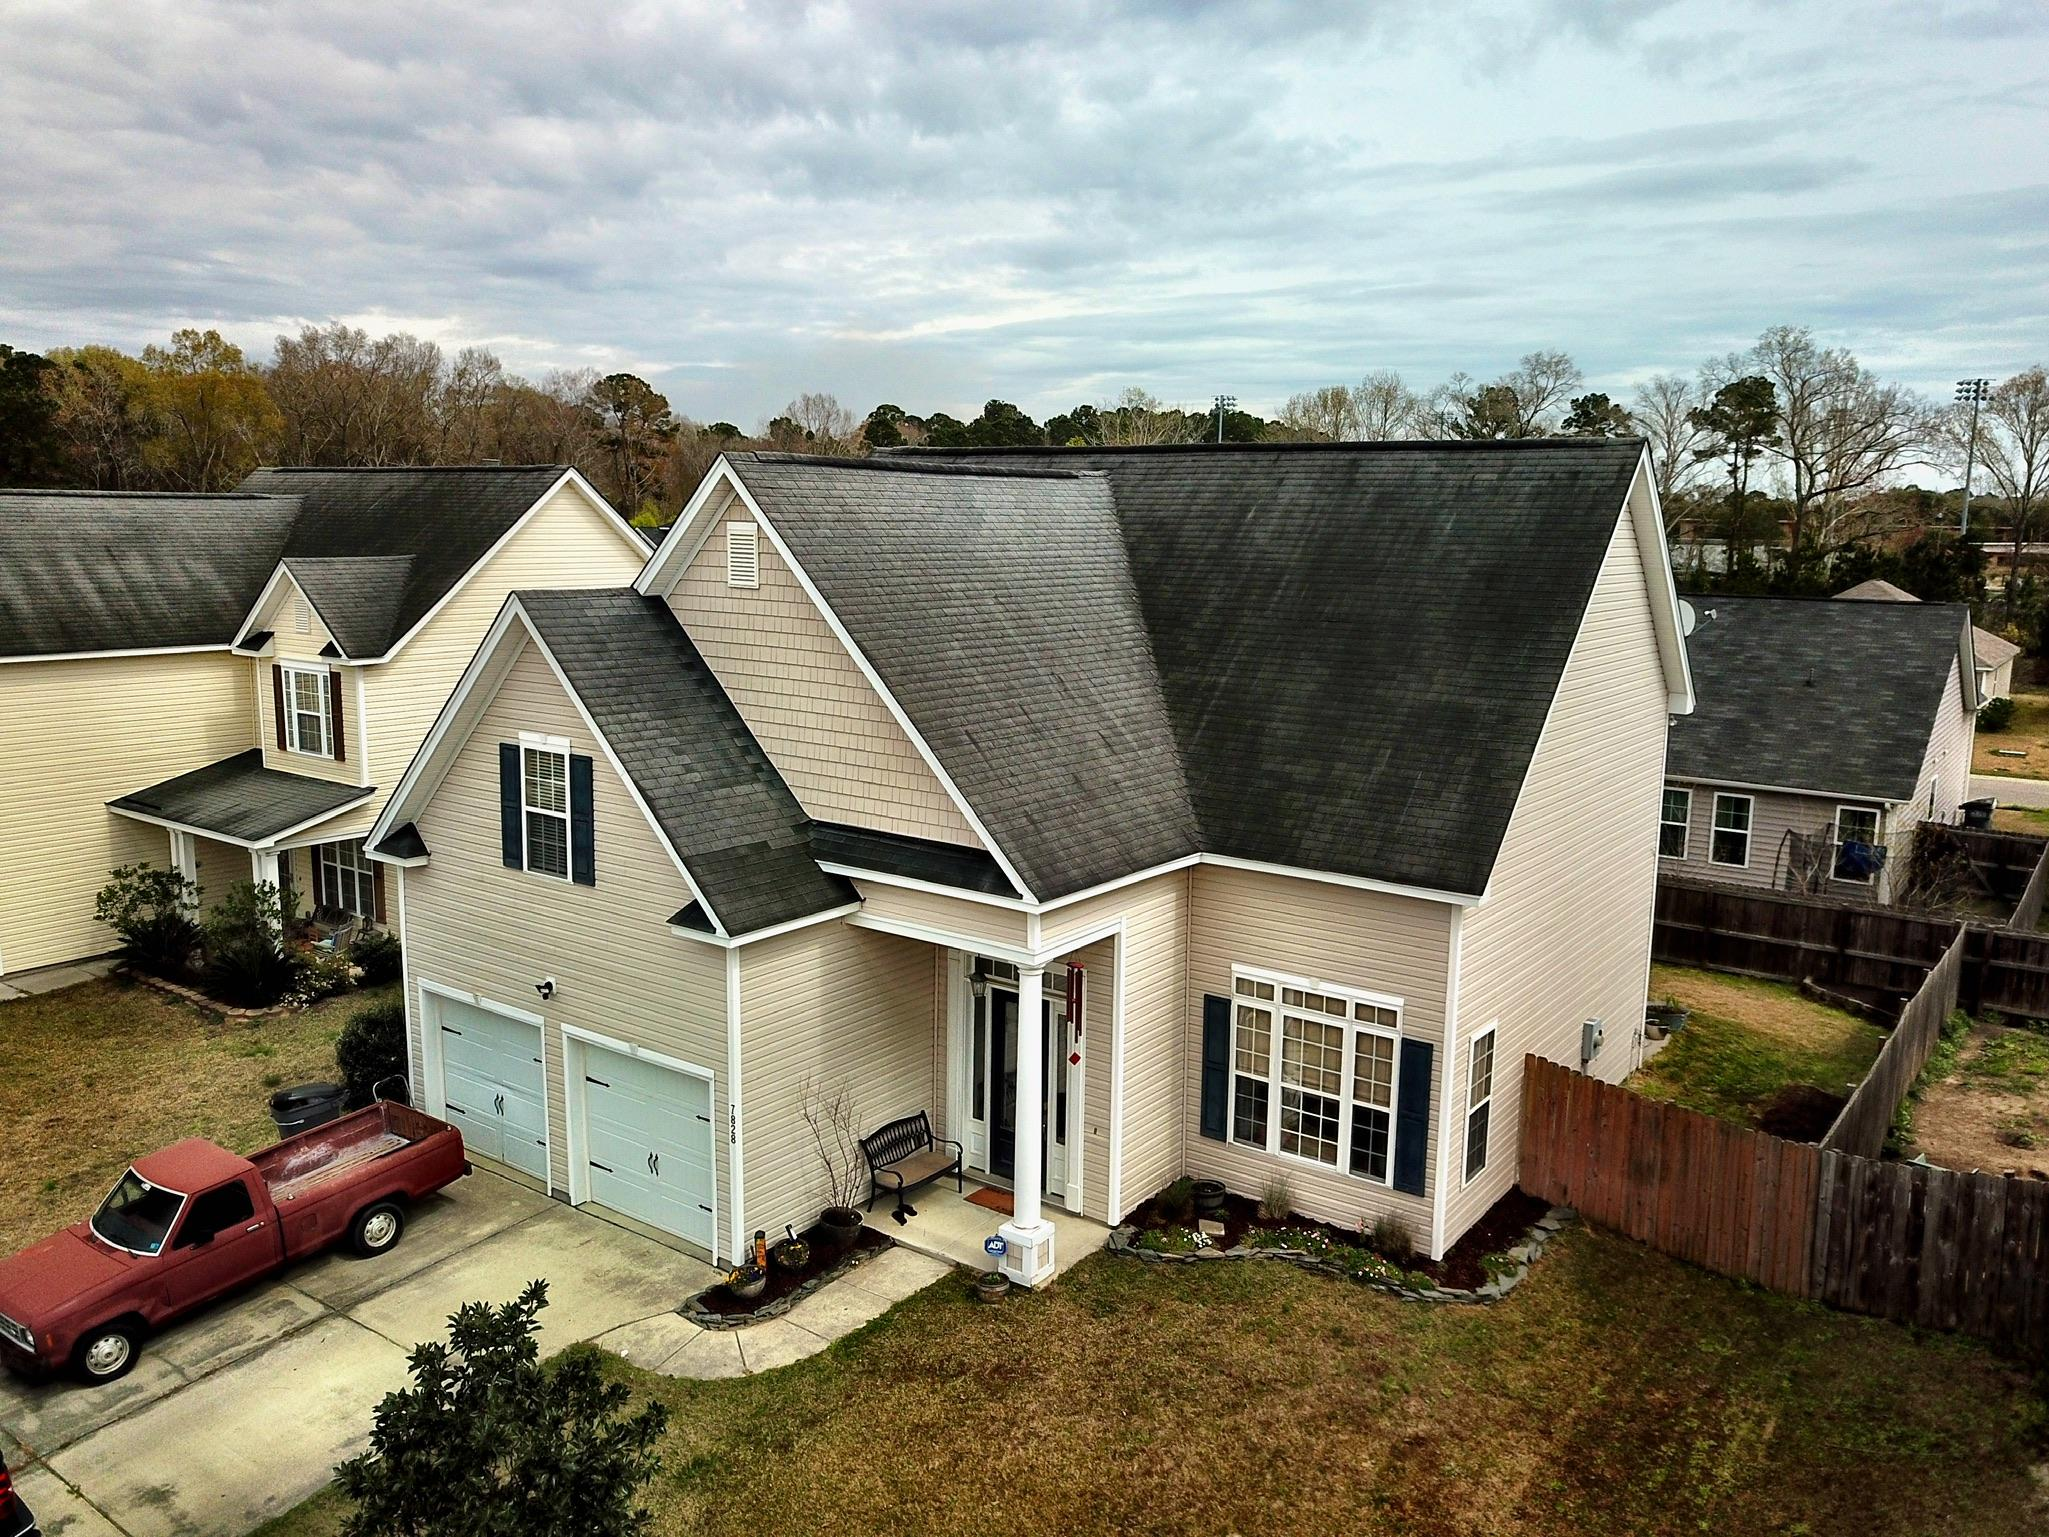 Colony North II Homes For Sale - 7828 Magellan, North Charleston, SC - 8